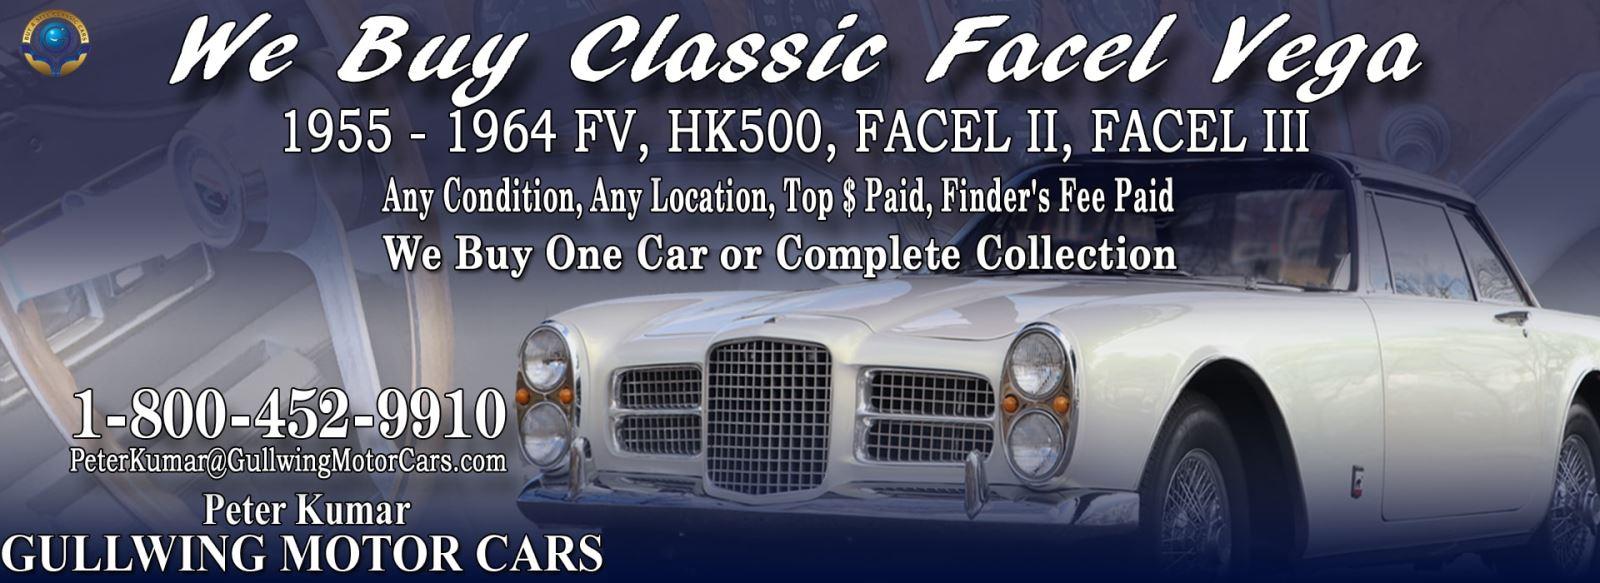 Classic Facel Vega for sale, we buy vintage Facel Vega. Call Peter Kumar. Gullwing Motor